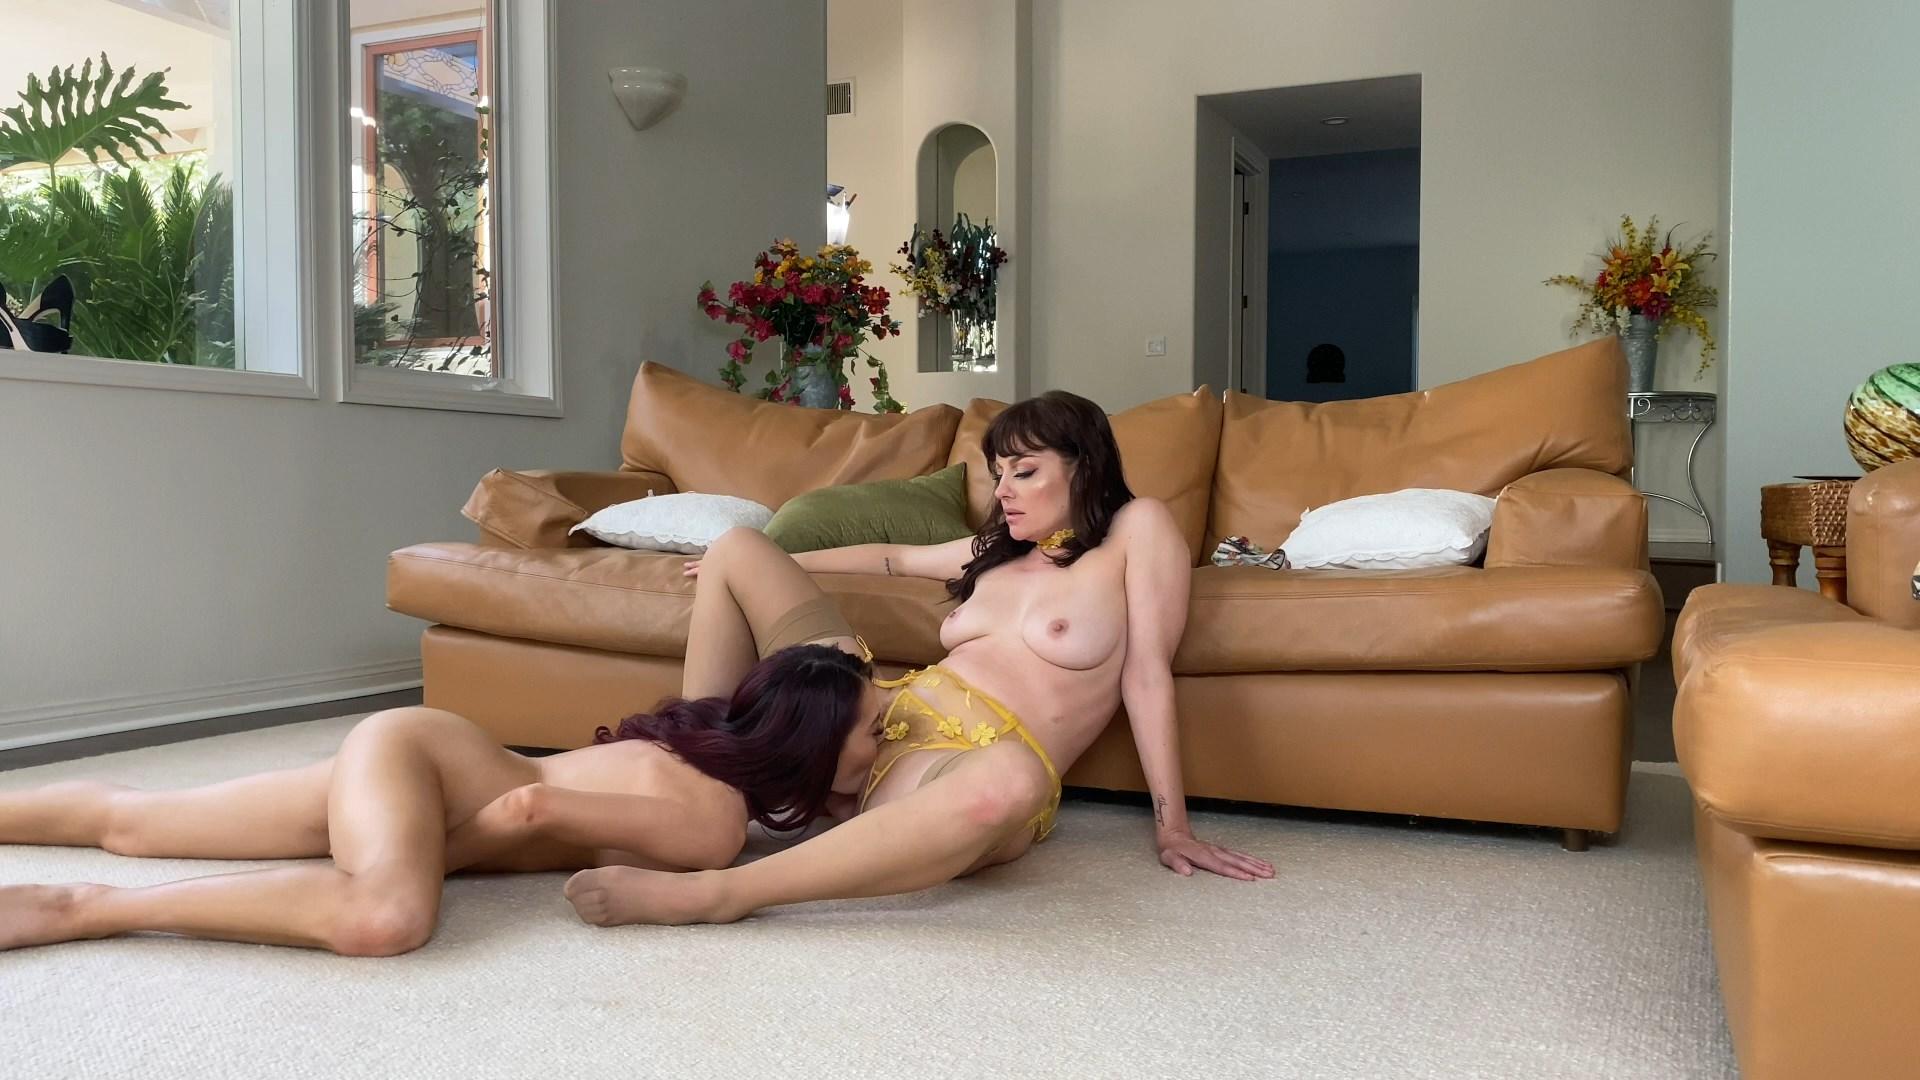 Sabina Rouge - Horny Step Mom Hookup